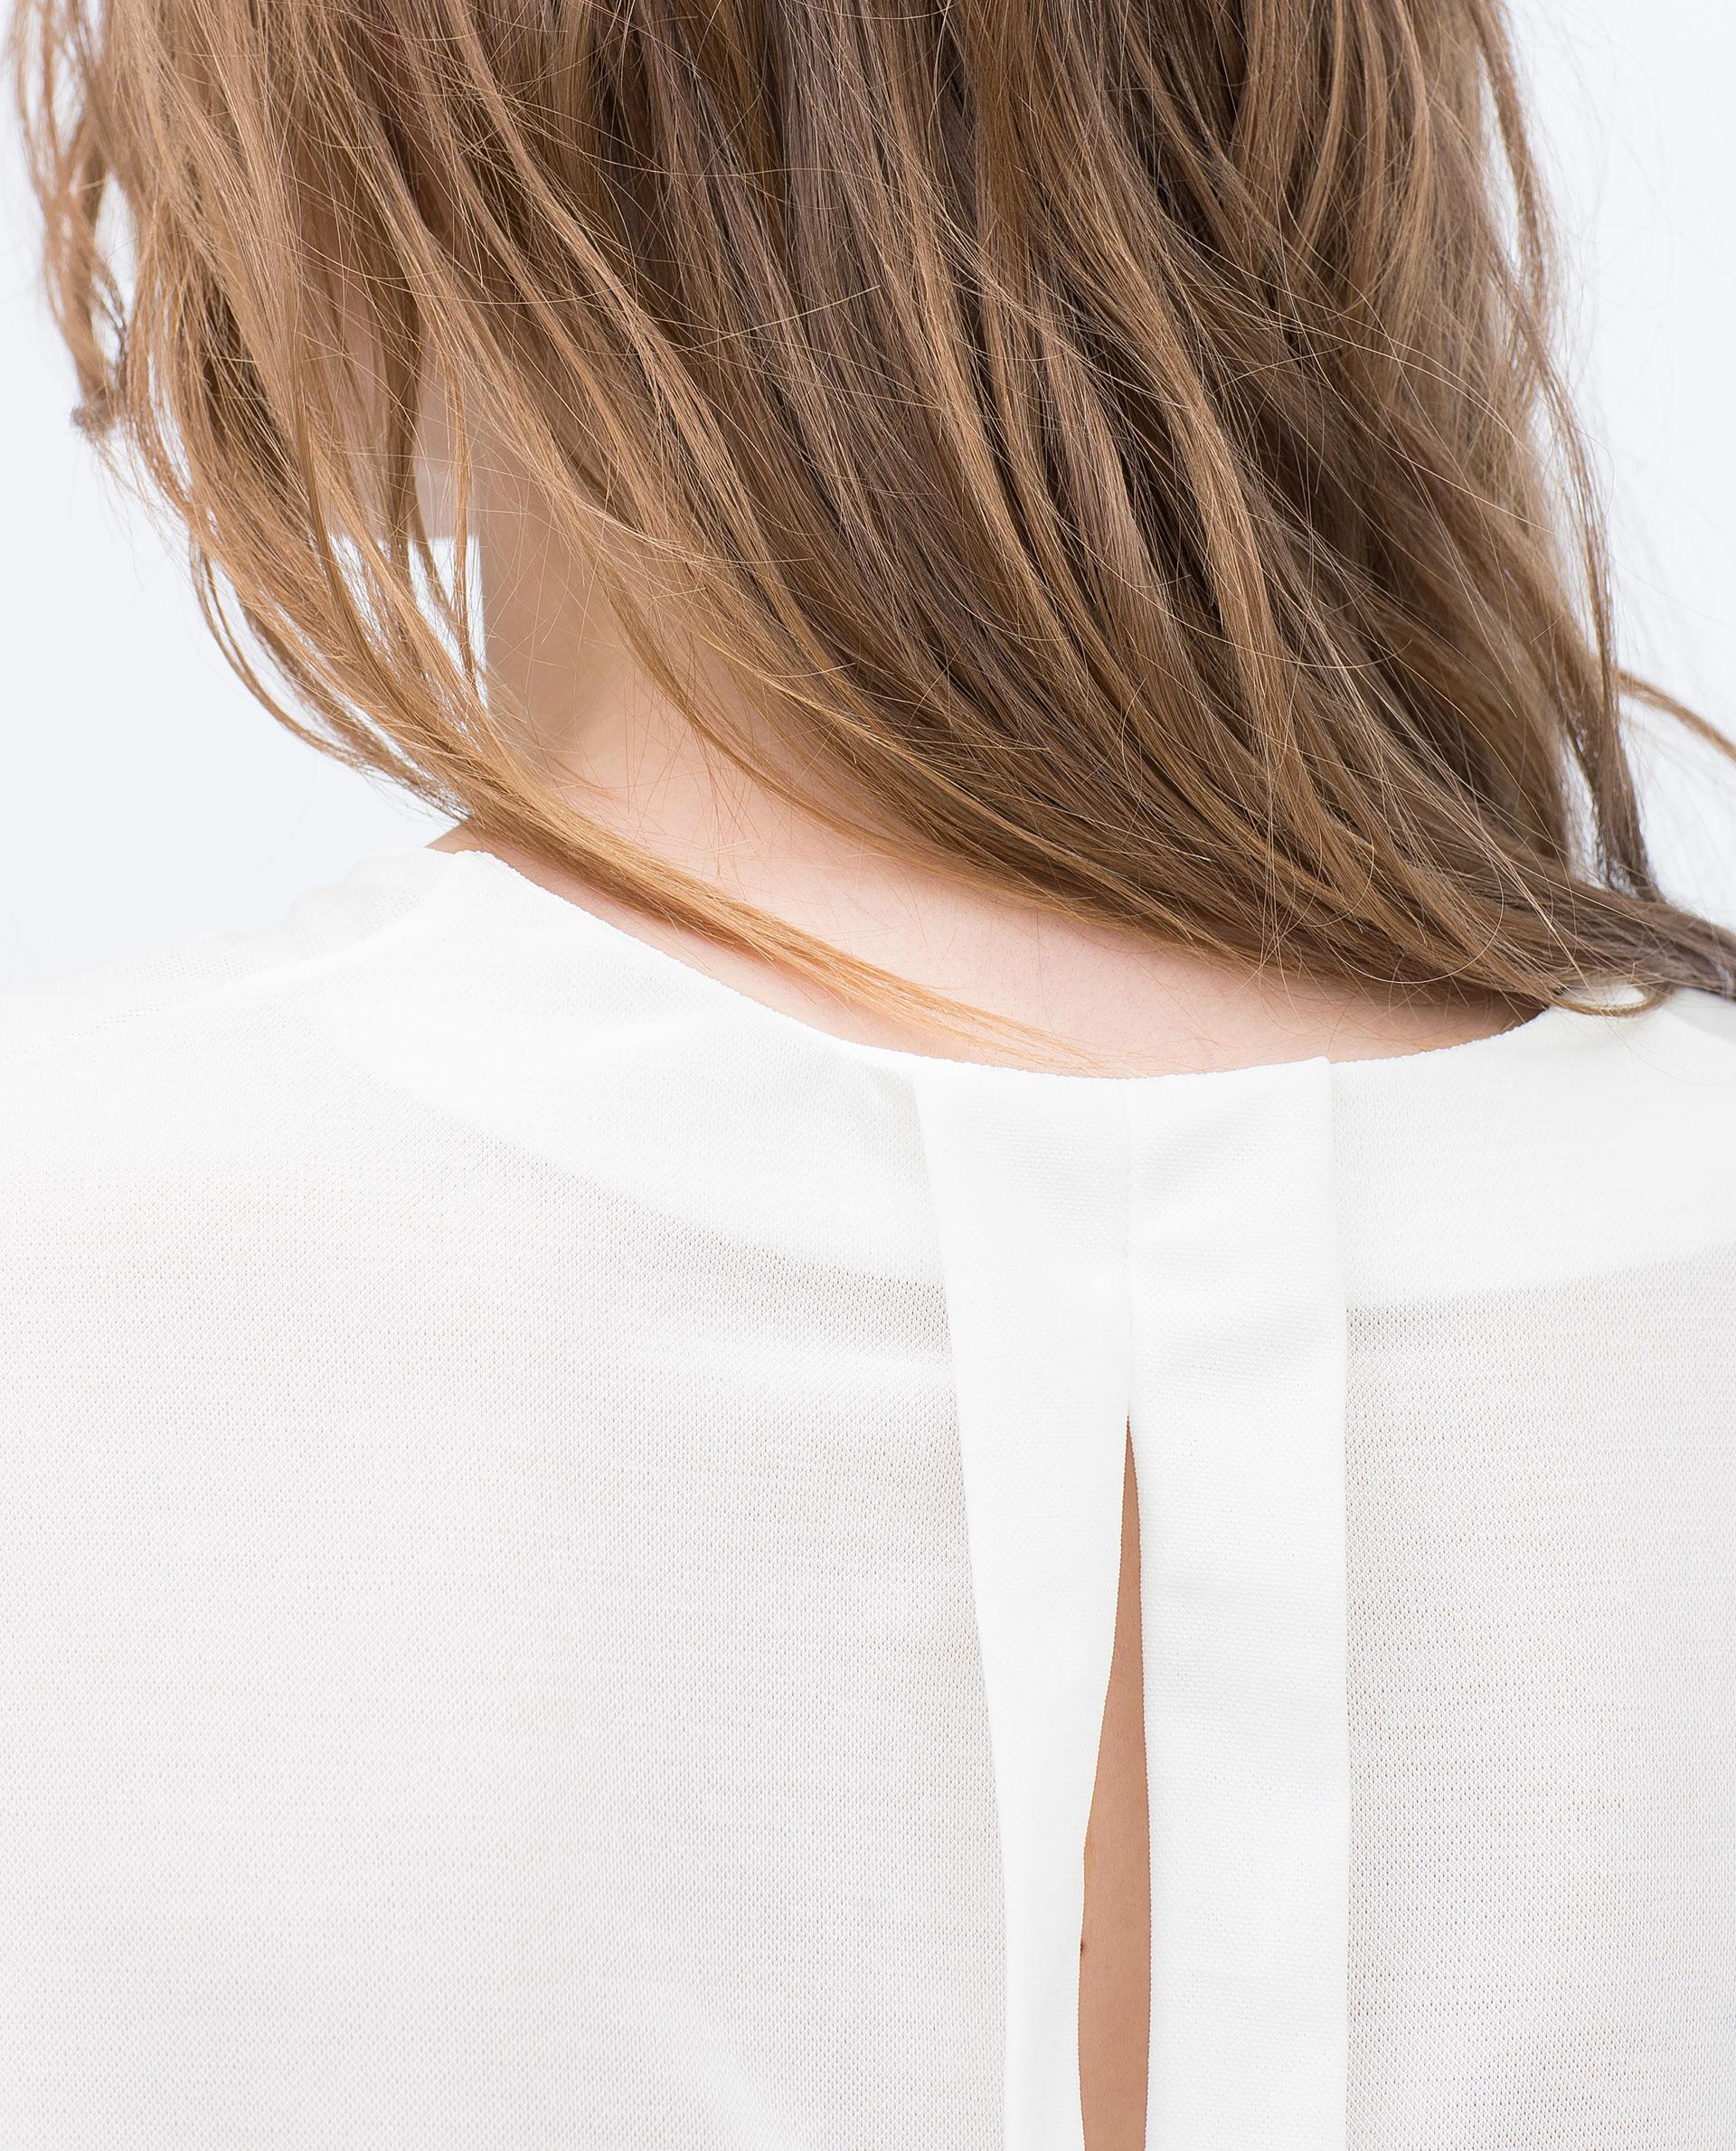 Zara Shirt Style Blouse 74